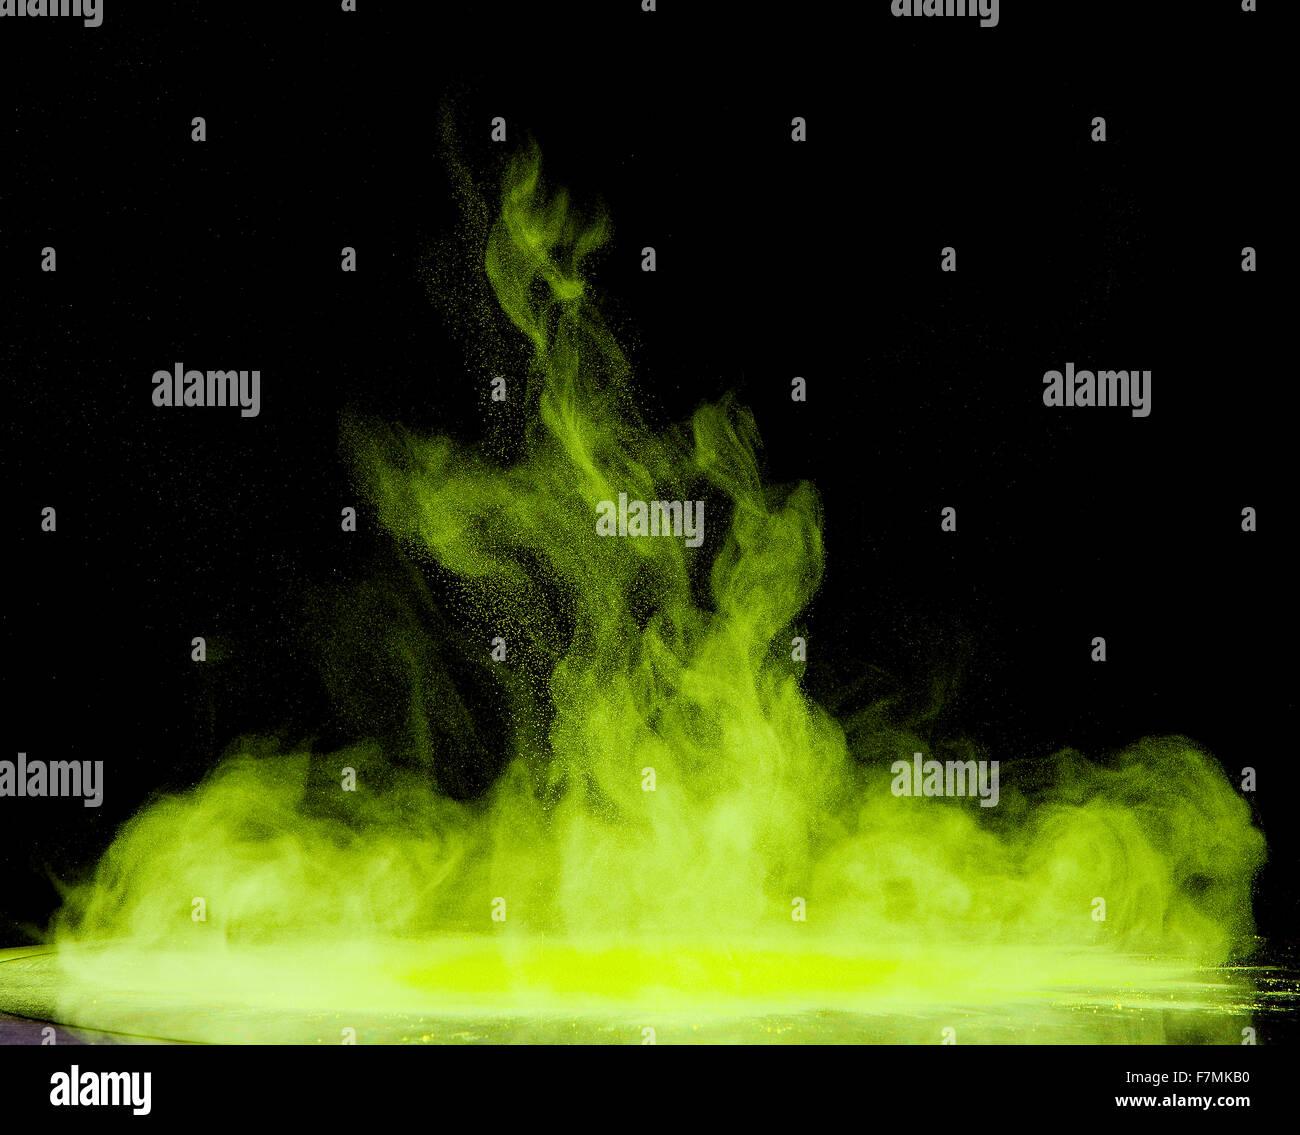 color splash - Stock Image